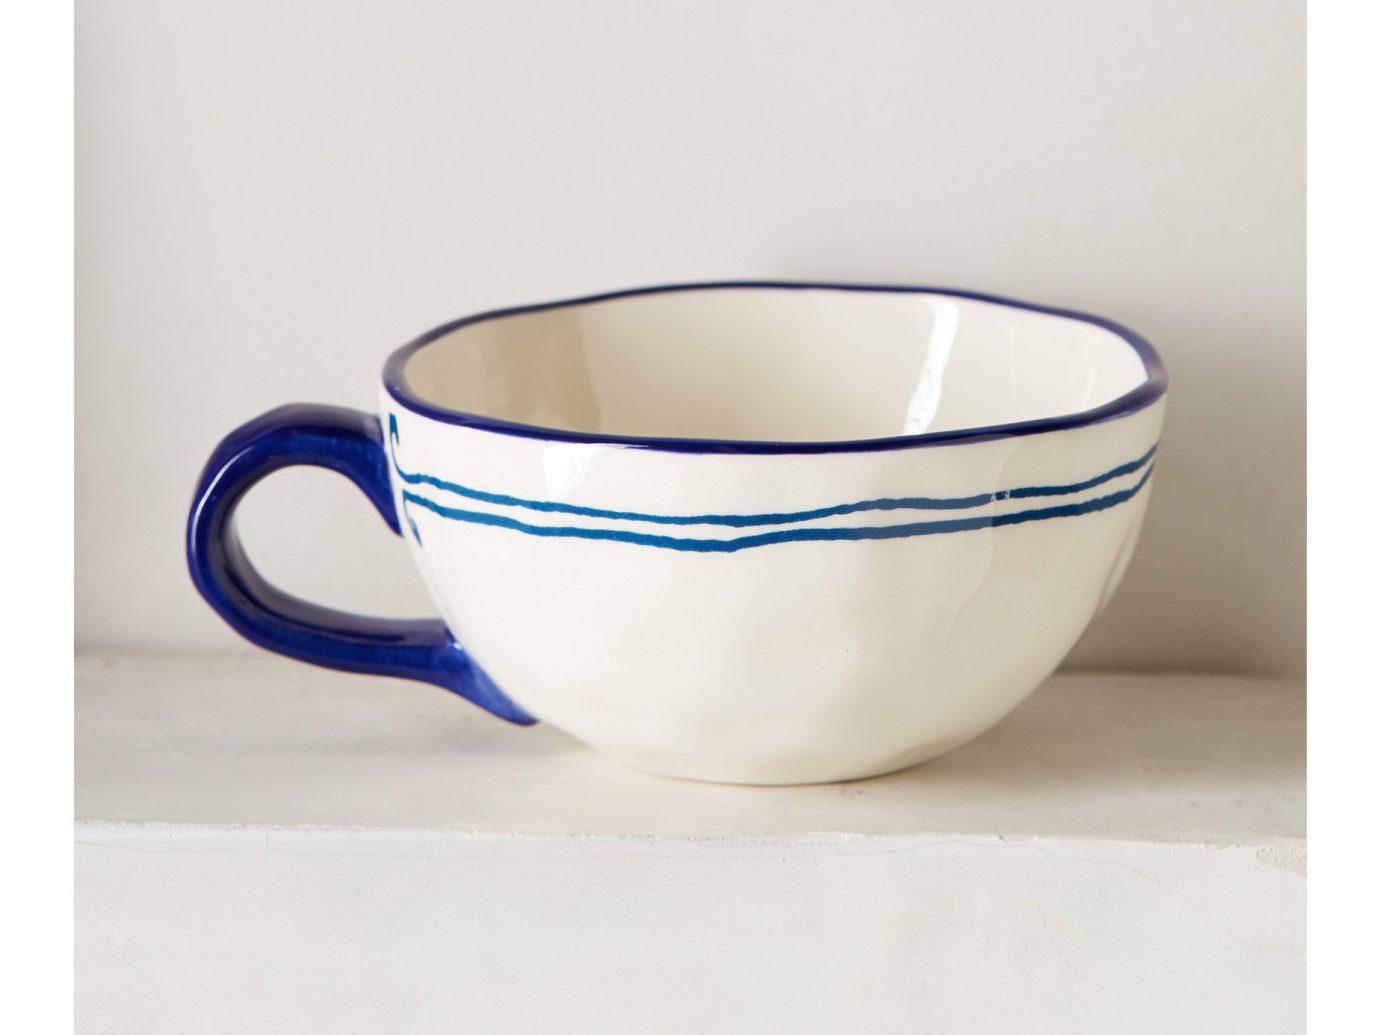 Style + Design indoor bowl cup saucer coffee cup tableware mug ceramic drinkware mixing bowl serveware porcelain dishware ceramic ware teacup